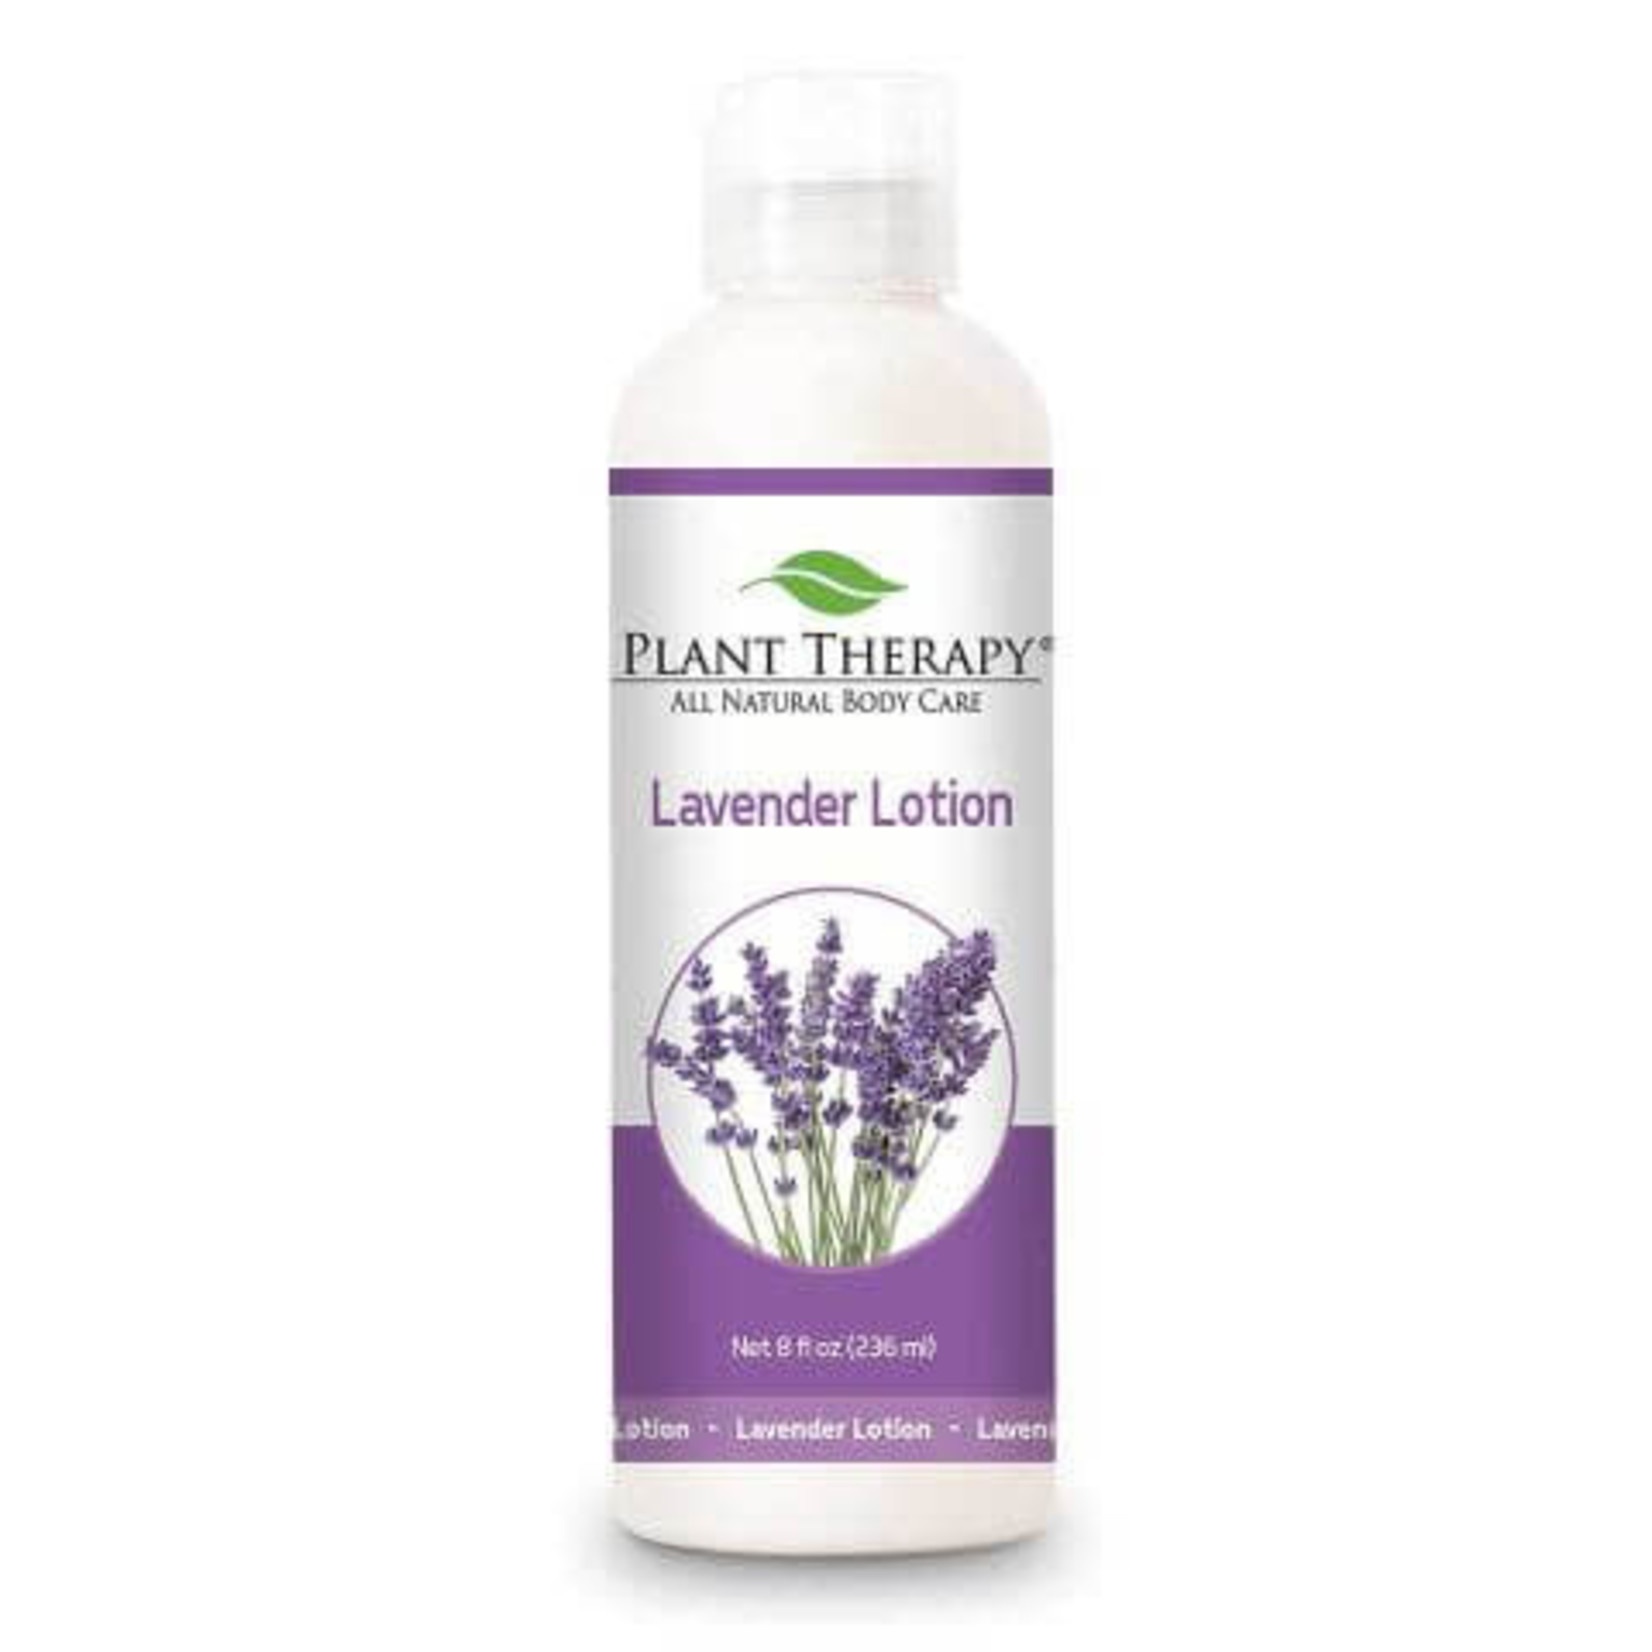 Plant Therapy PT Lavender Lotion 8oz